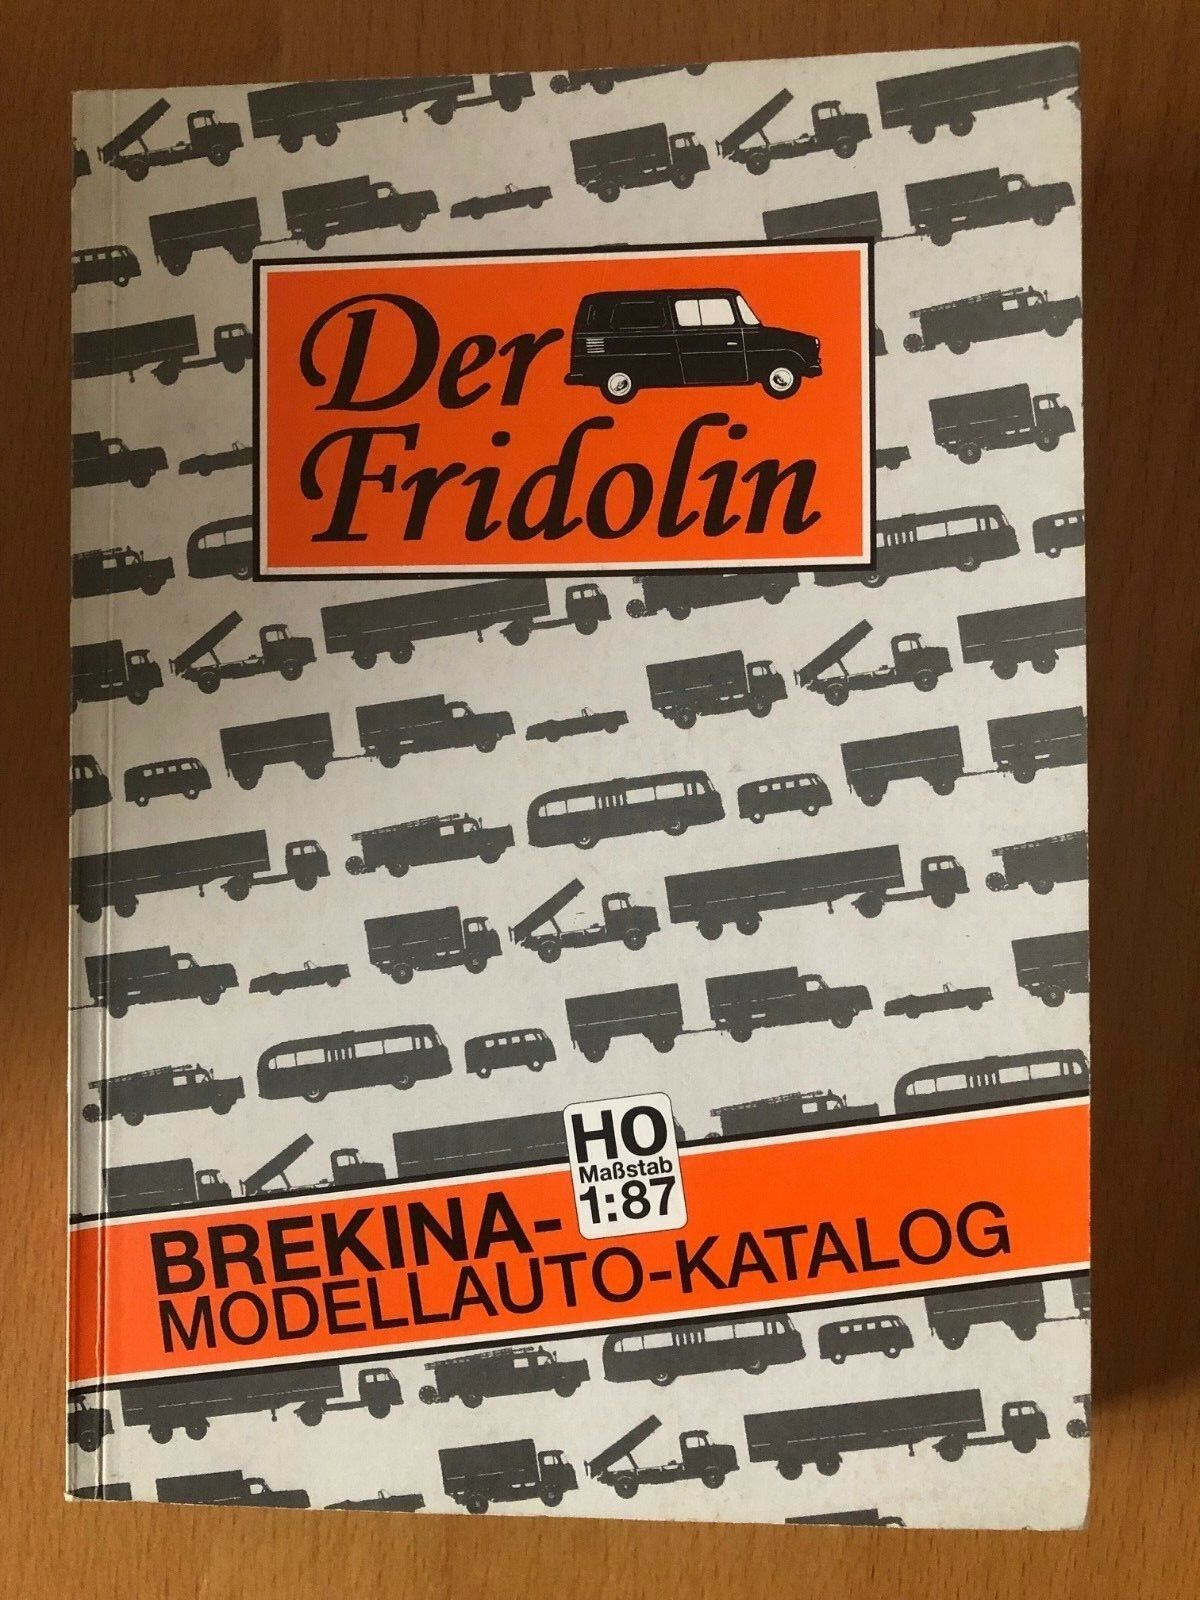 Der Fridolin - Brekina Modellauto Katalog - Tugemann - 1. Auflage 1998 - RARITÄT